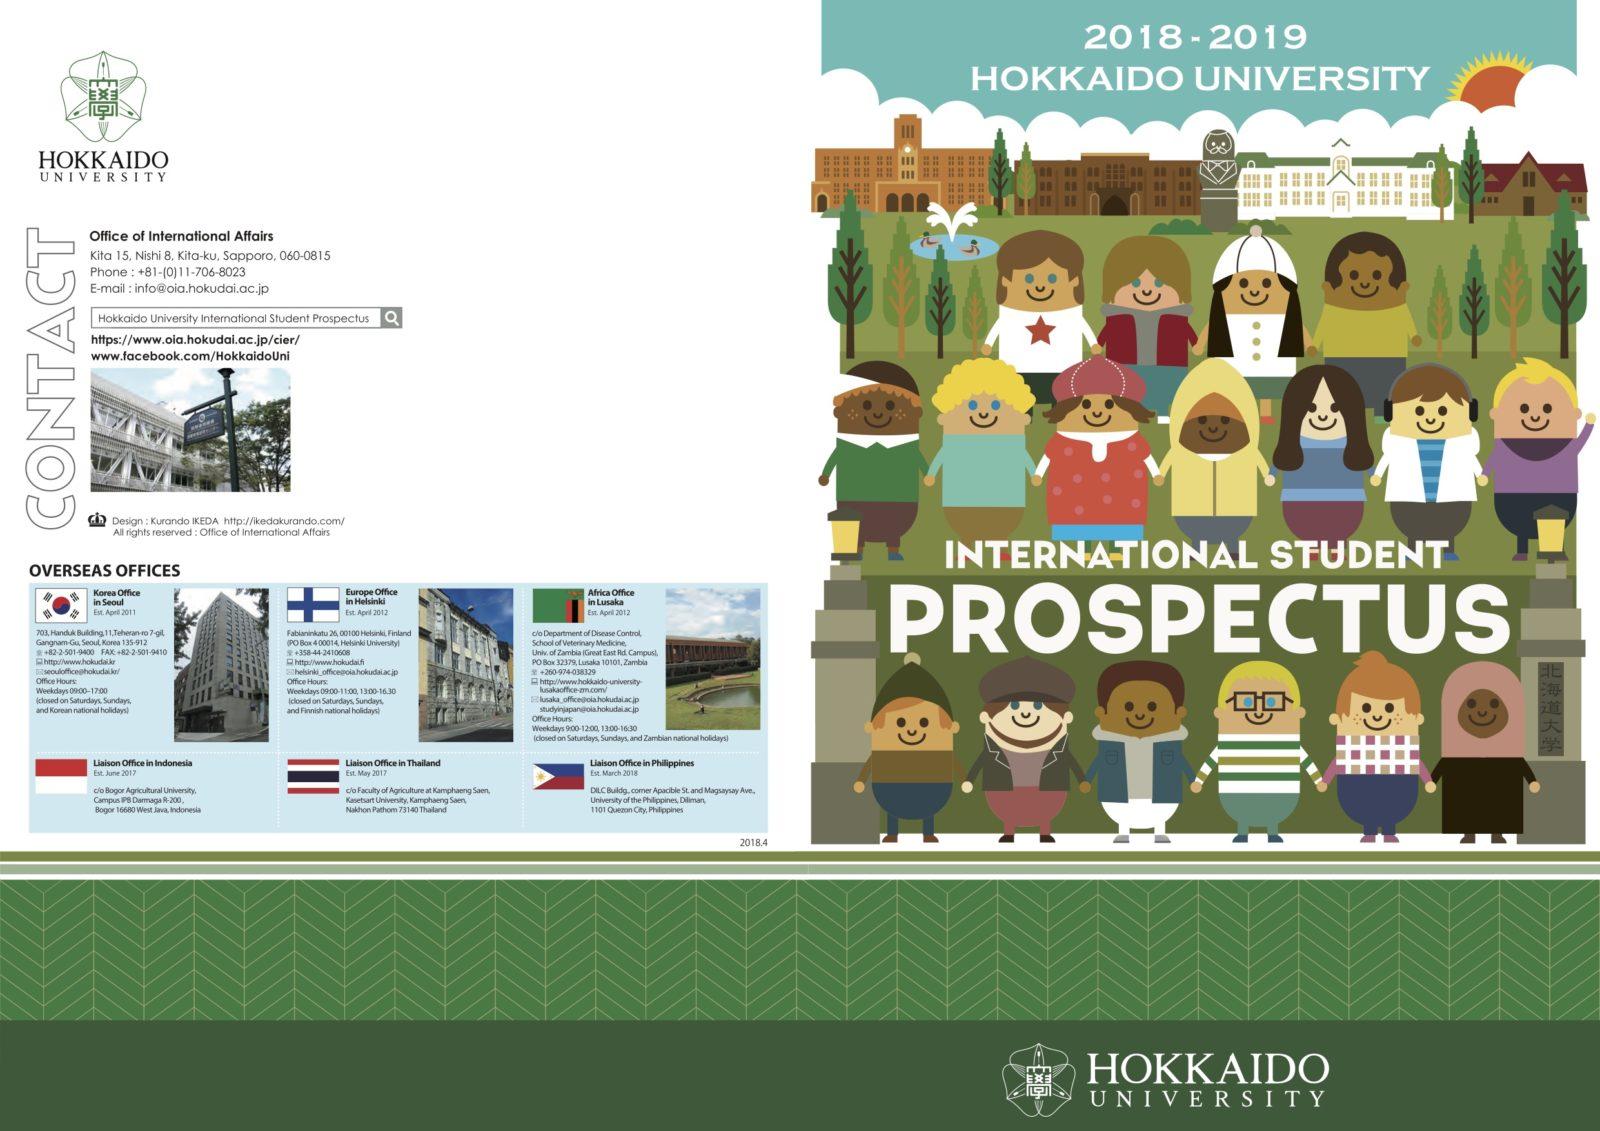 HU International Student Prospectus 2017-2018